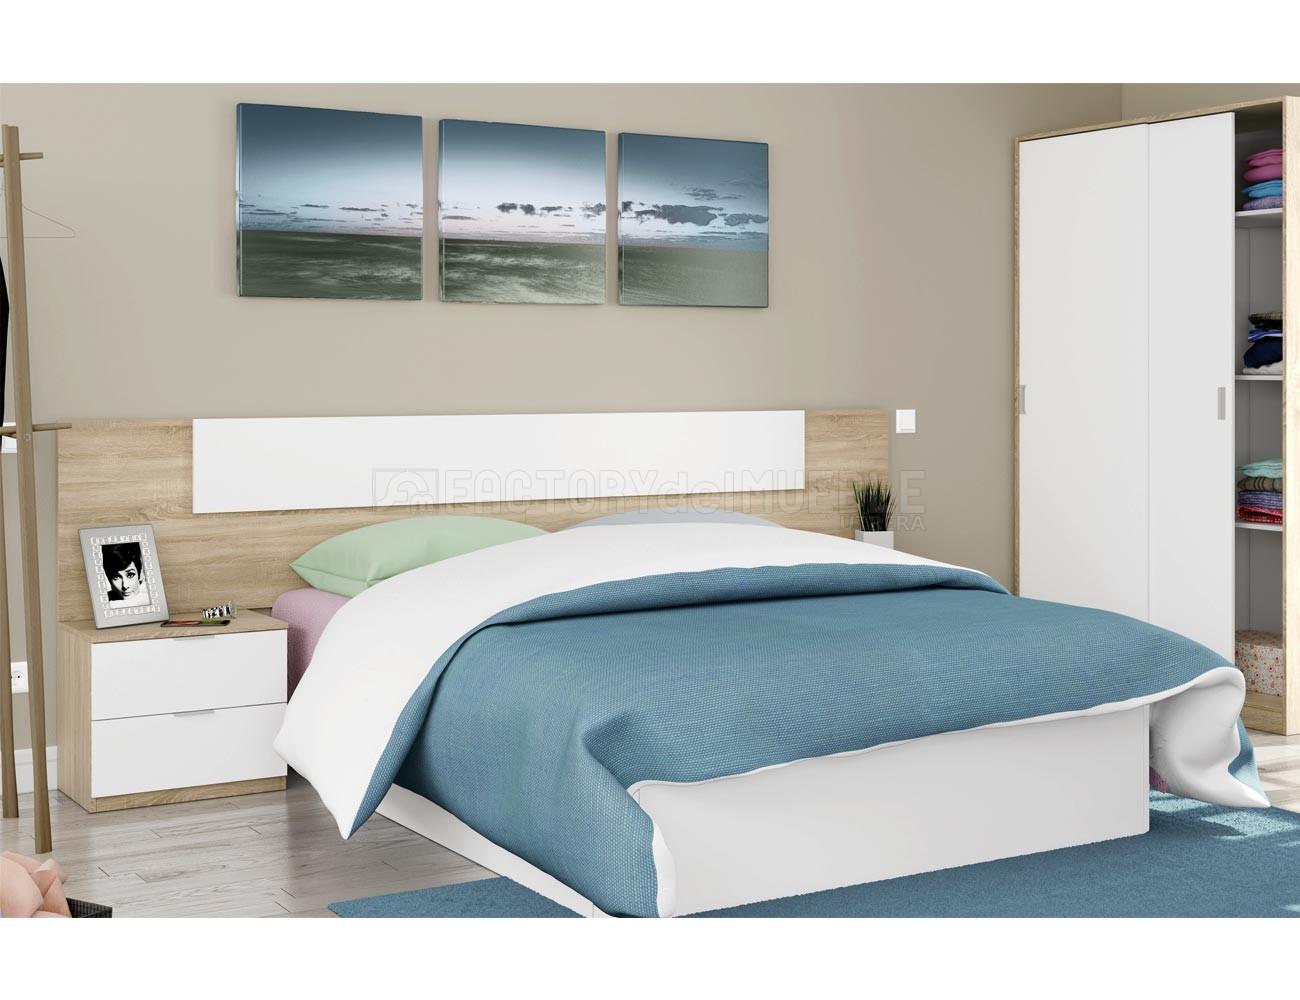 Dormitorio matrimonio en Roble con blanco Artik